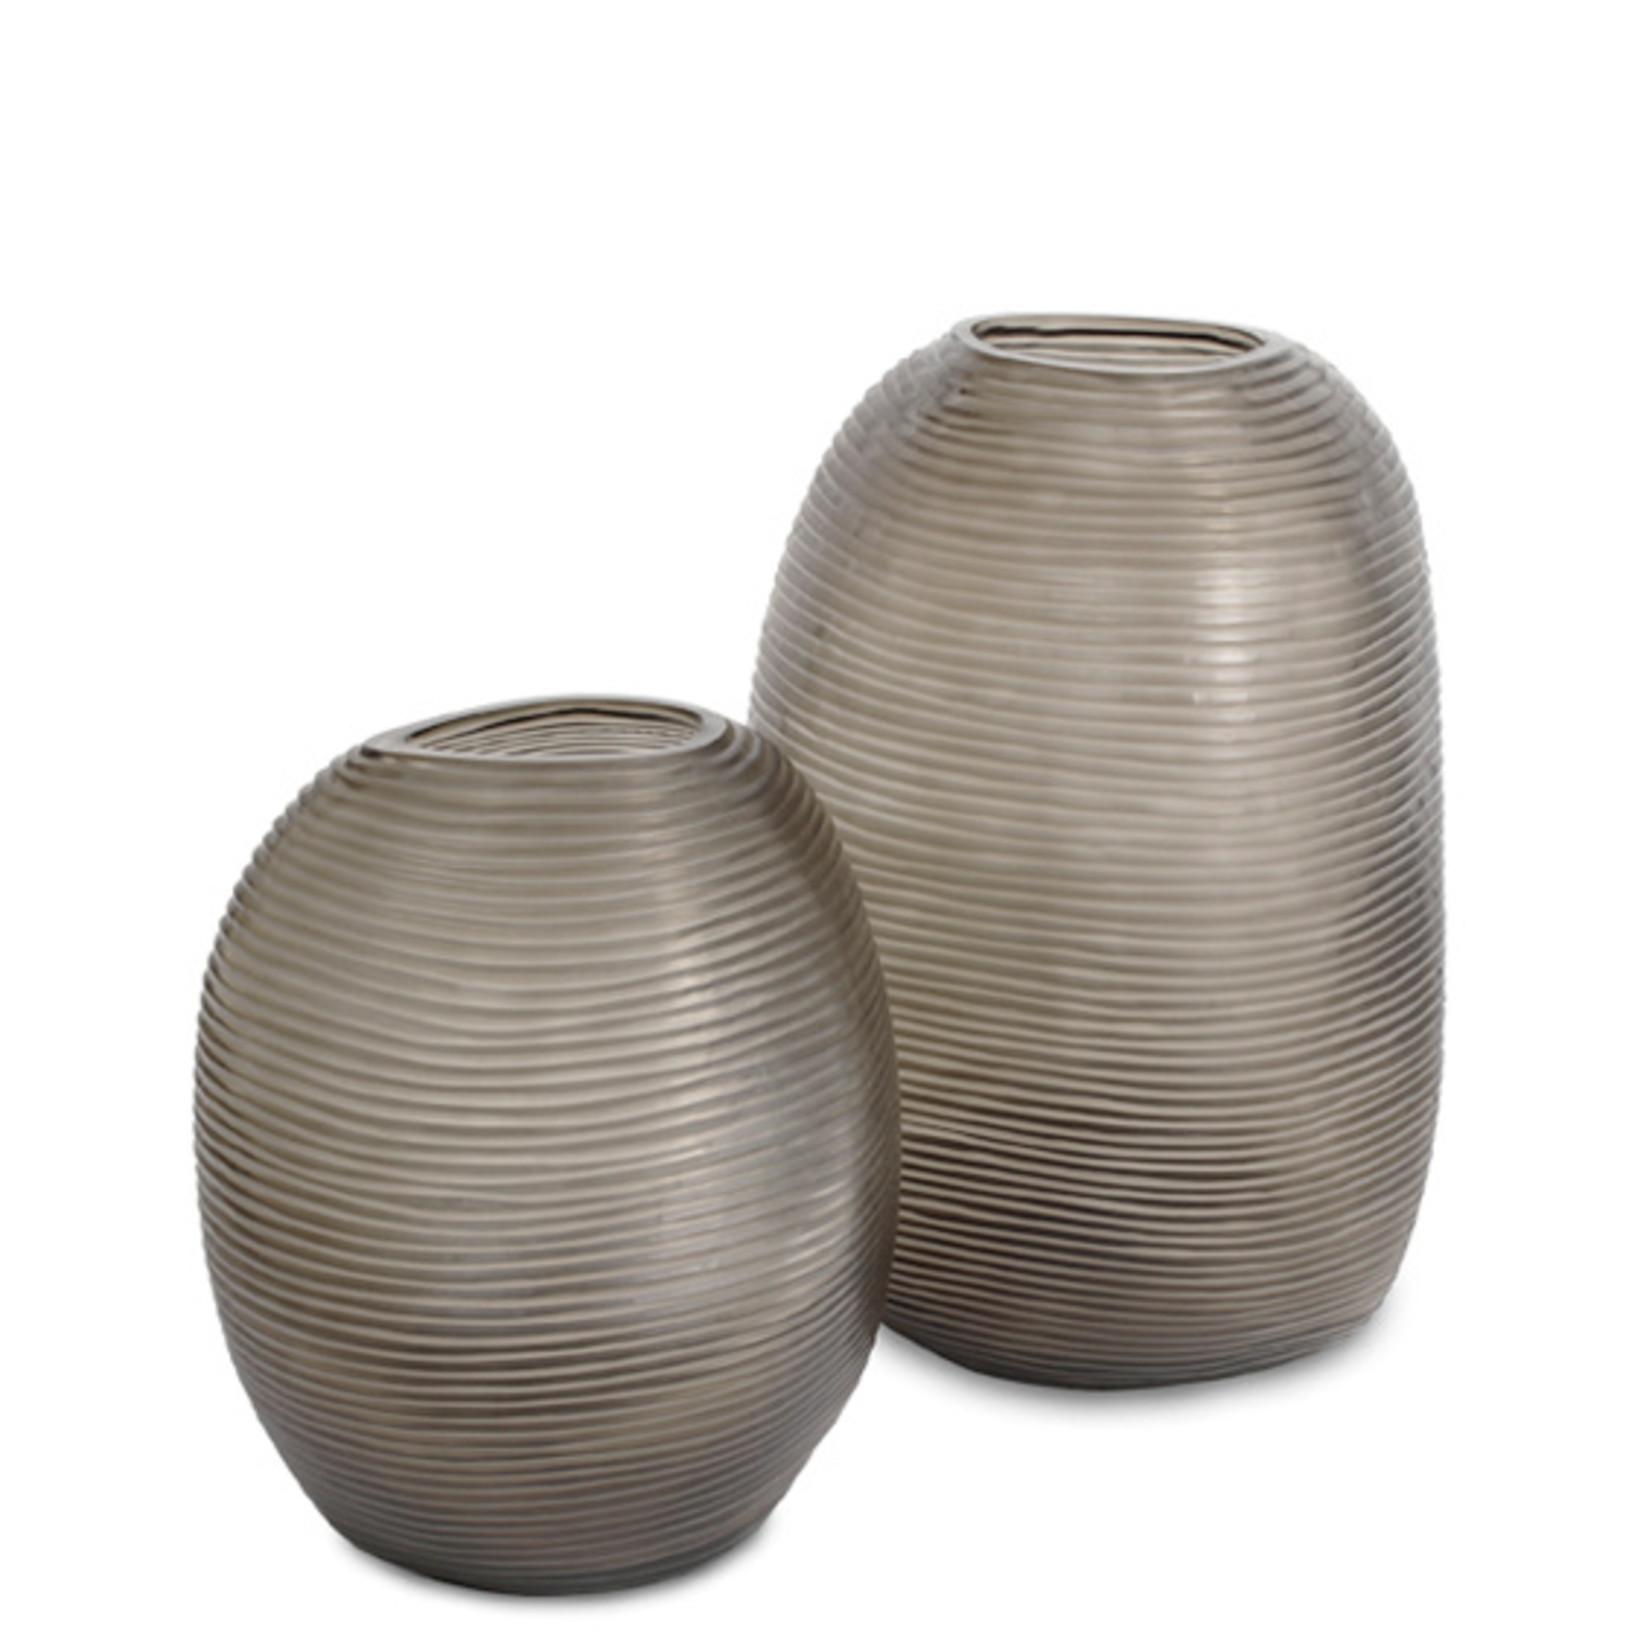 Guaxs Vase Patara Rond   Clair / Gris Fumée